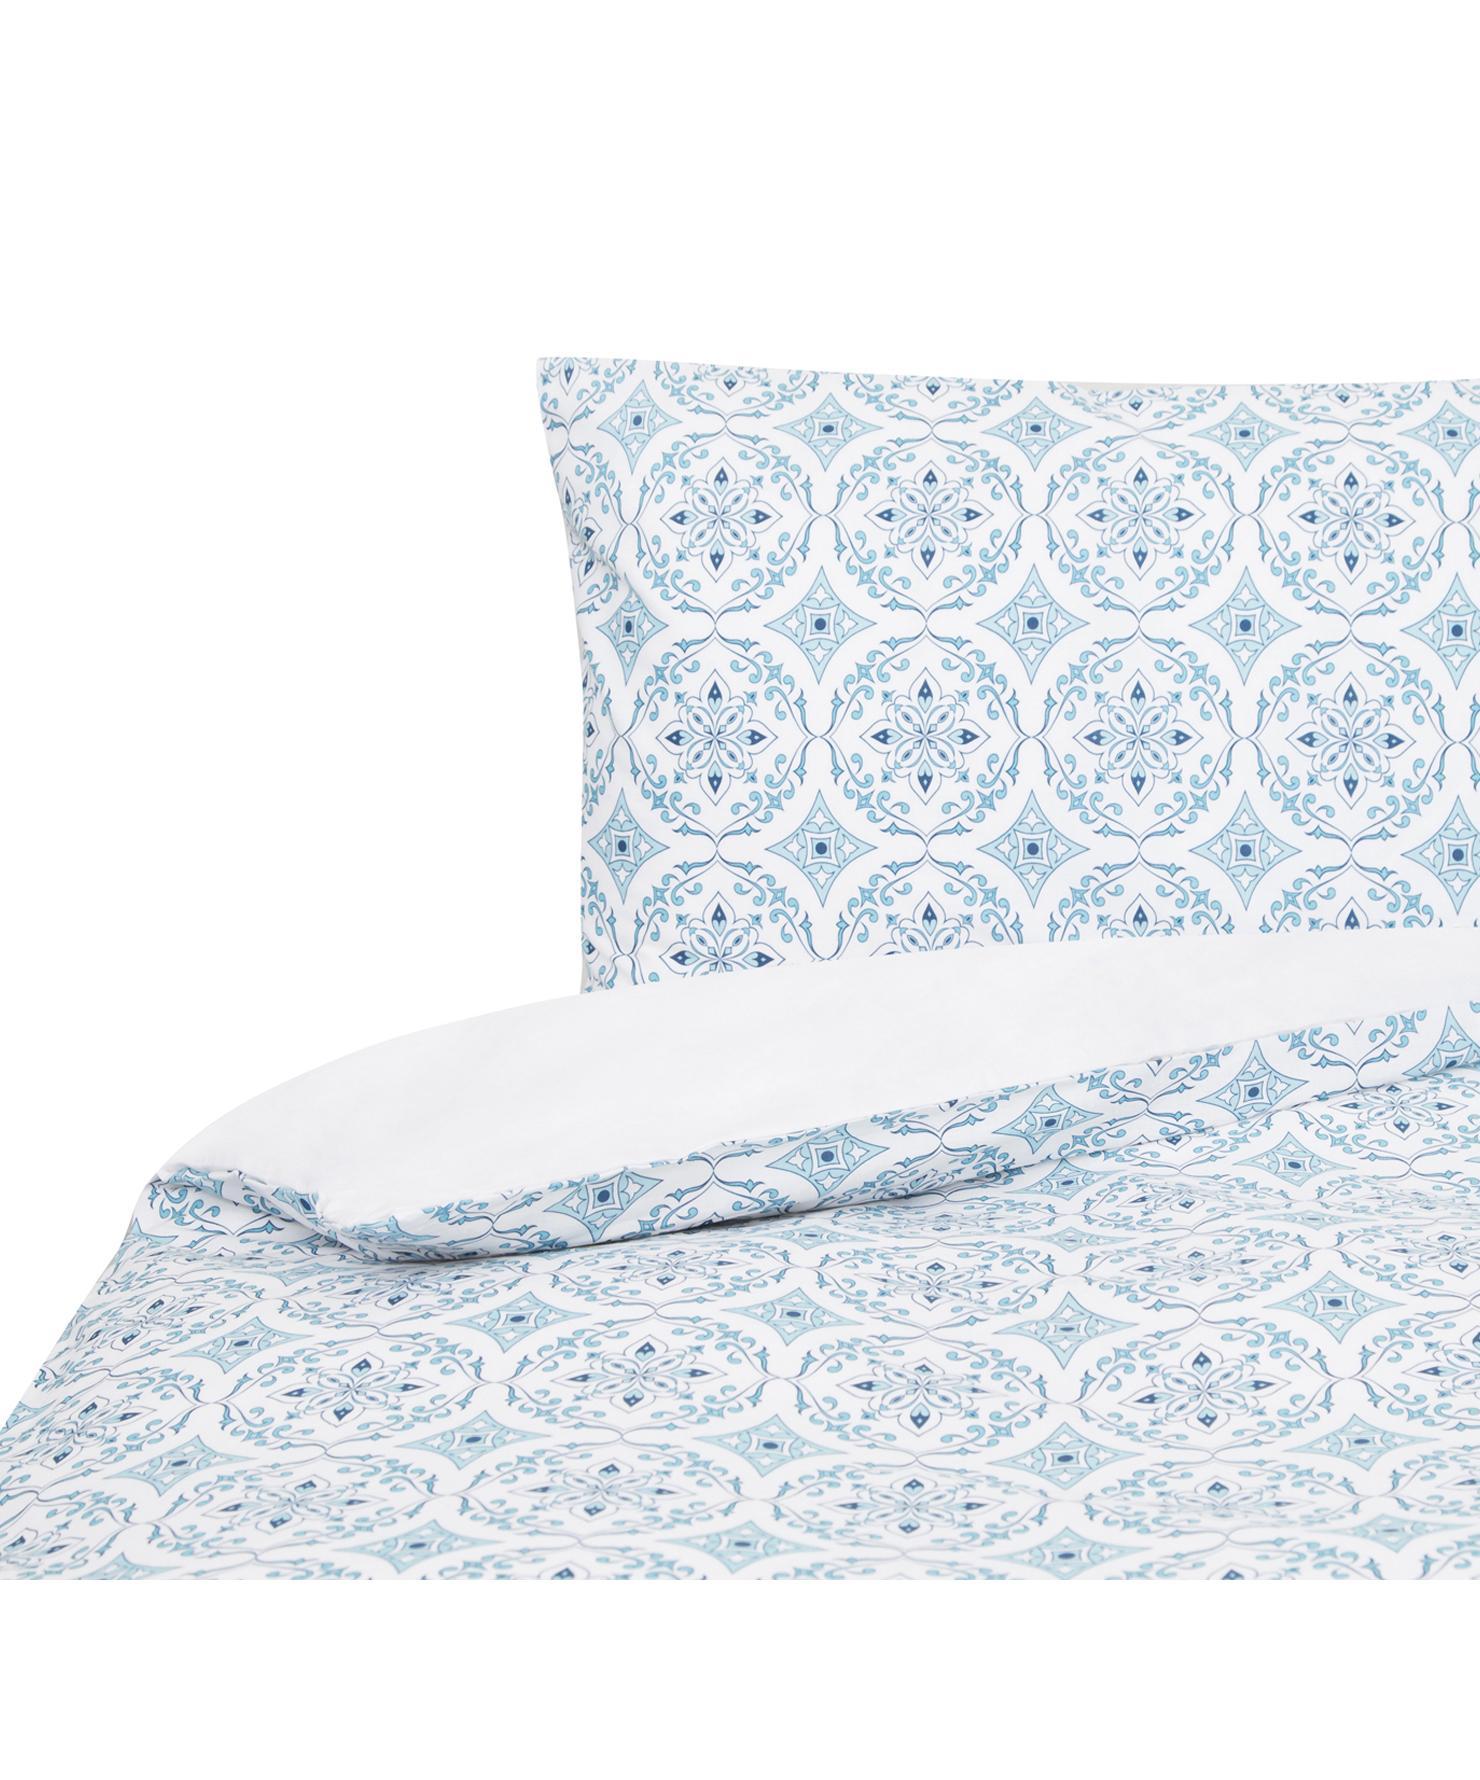 Funda nórdica doble cara Crackle , Algodón, Blanco, azul, Cama 90 cm (160 x 220 cm)